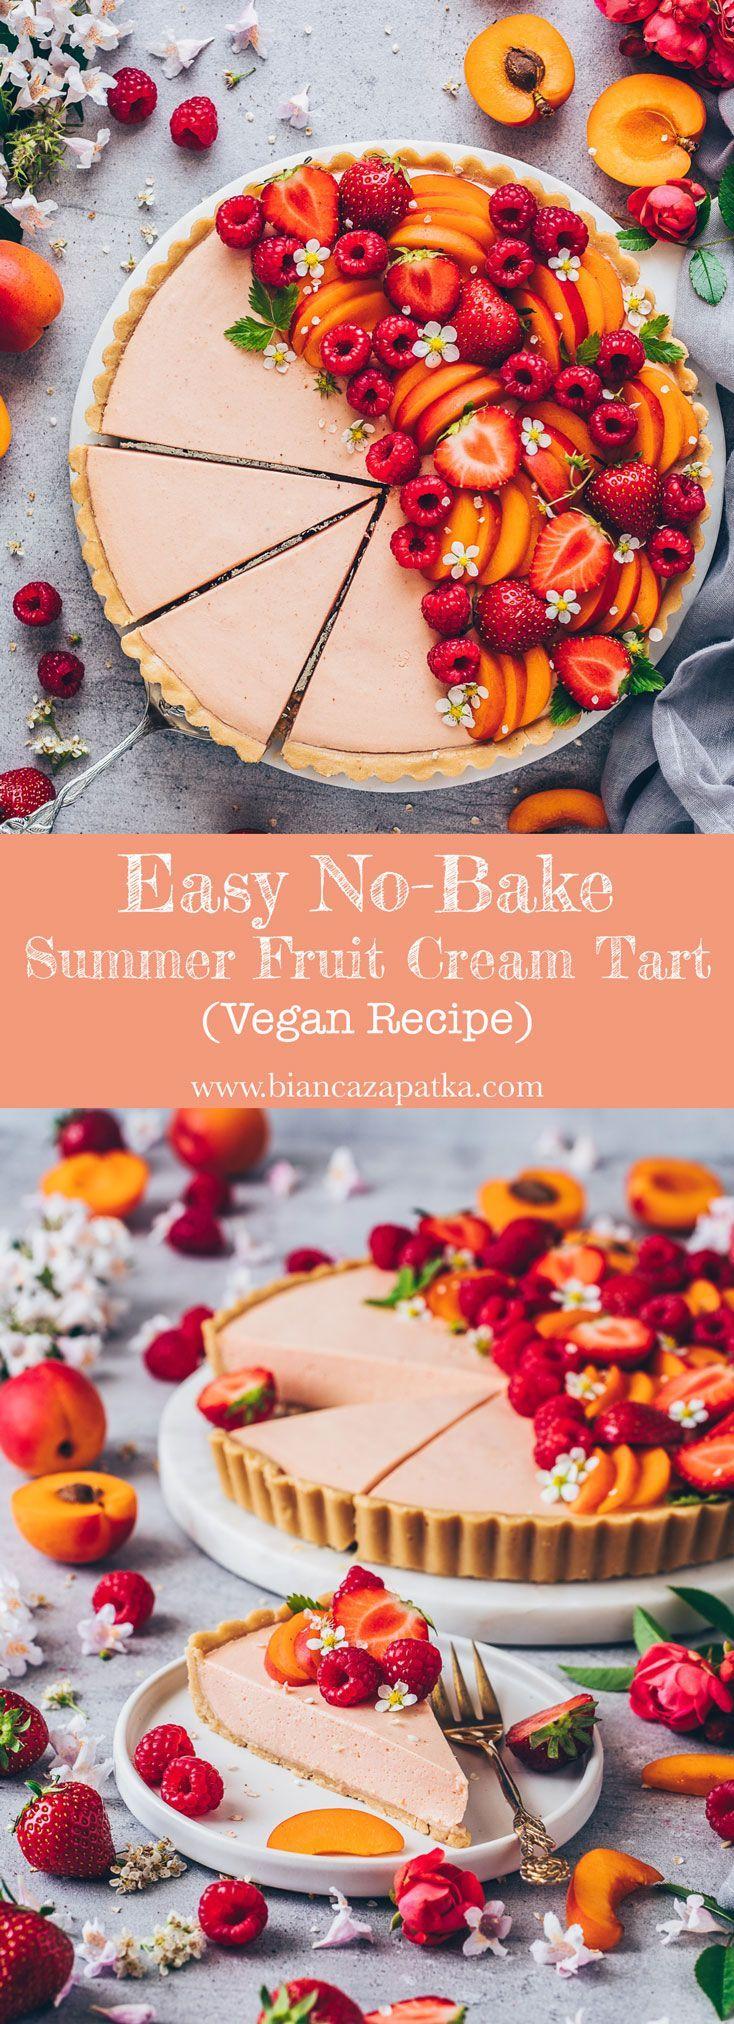 Sommer Obstkuchen Rezept. Leichte vegane No-Bake-Torte aus einfachen Keksen…   – Sommer, Sonne, Strand & Meer